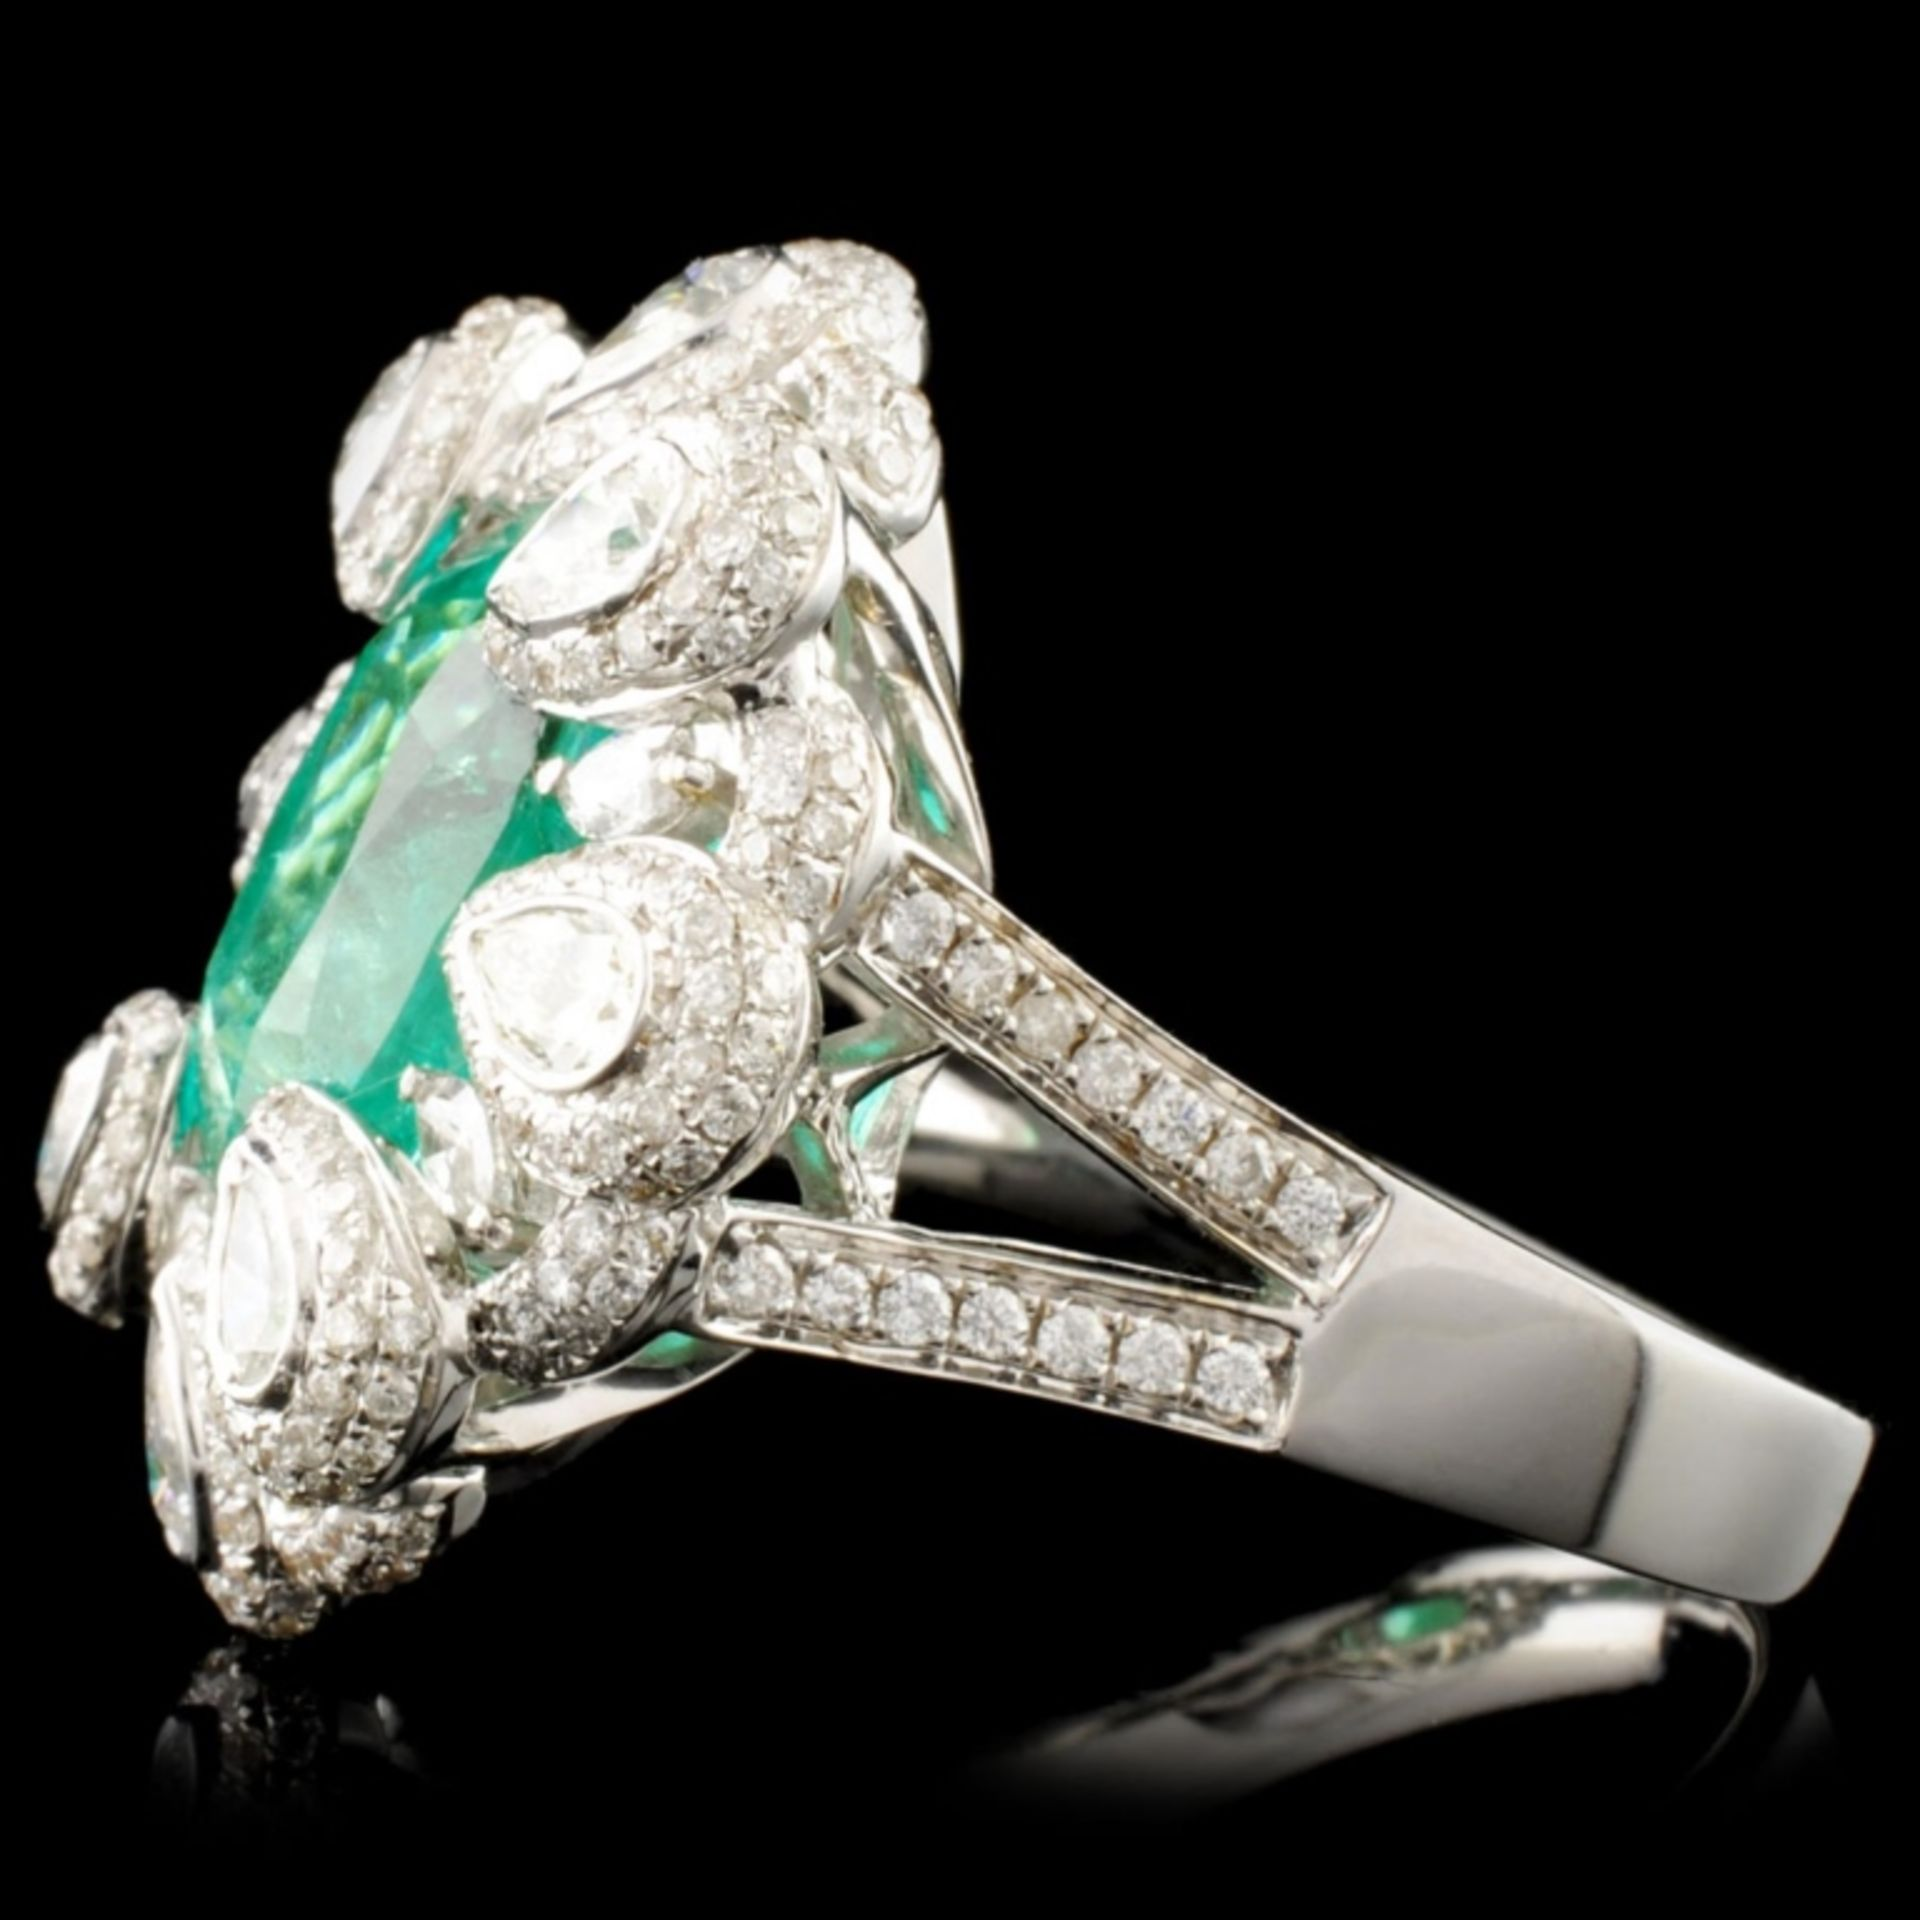 18K Gold 4.83ct Emerald & 2.02ctw Diamond Ring - Image 4 of 5